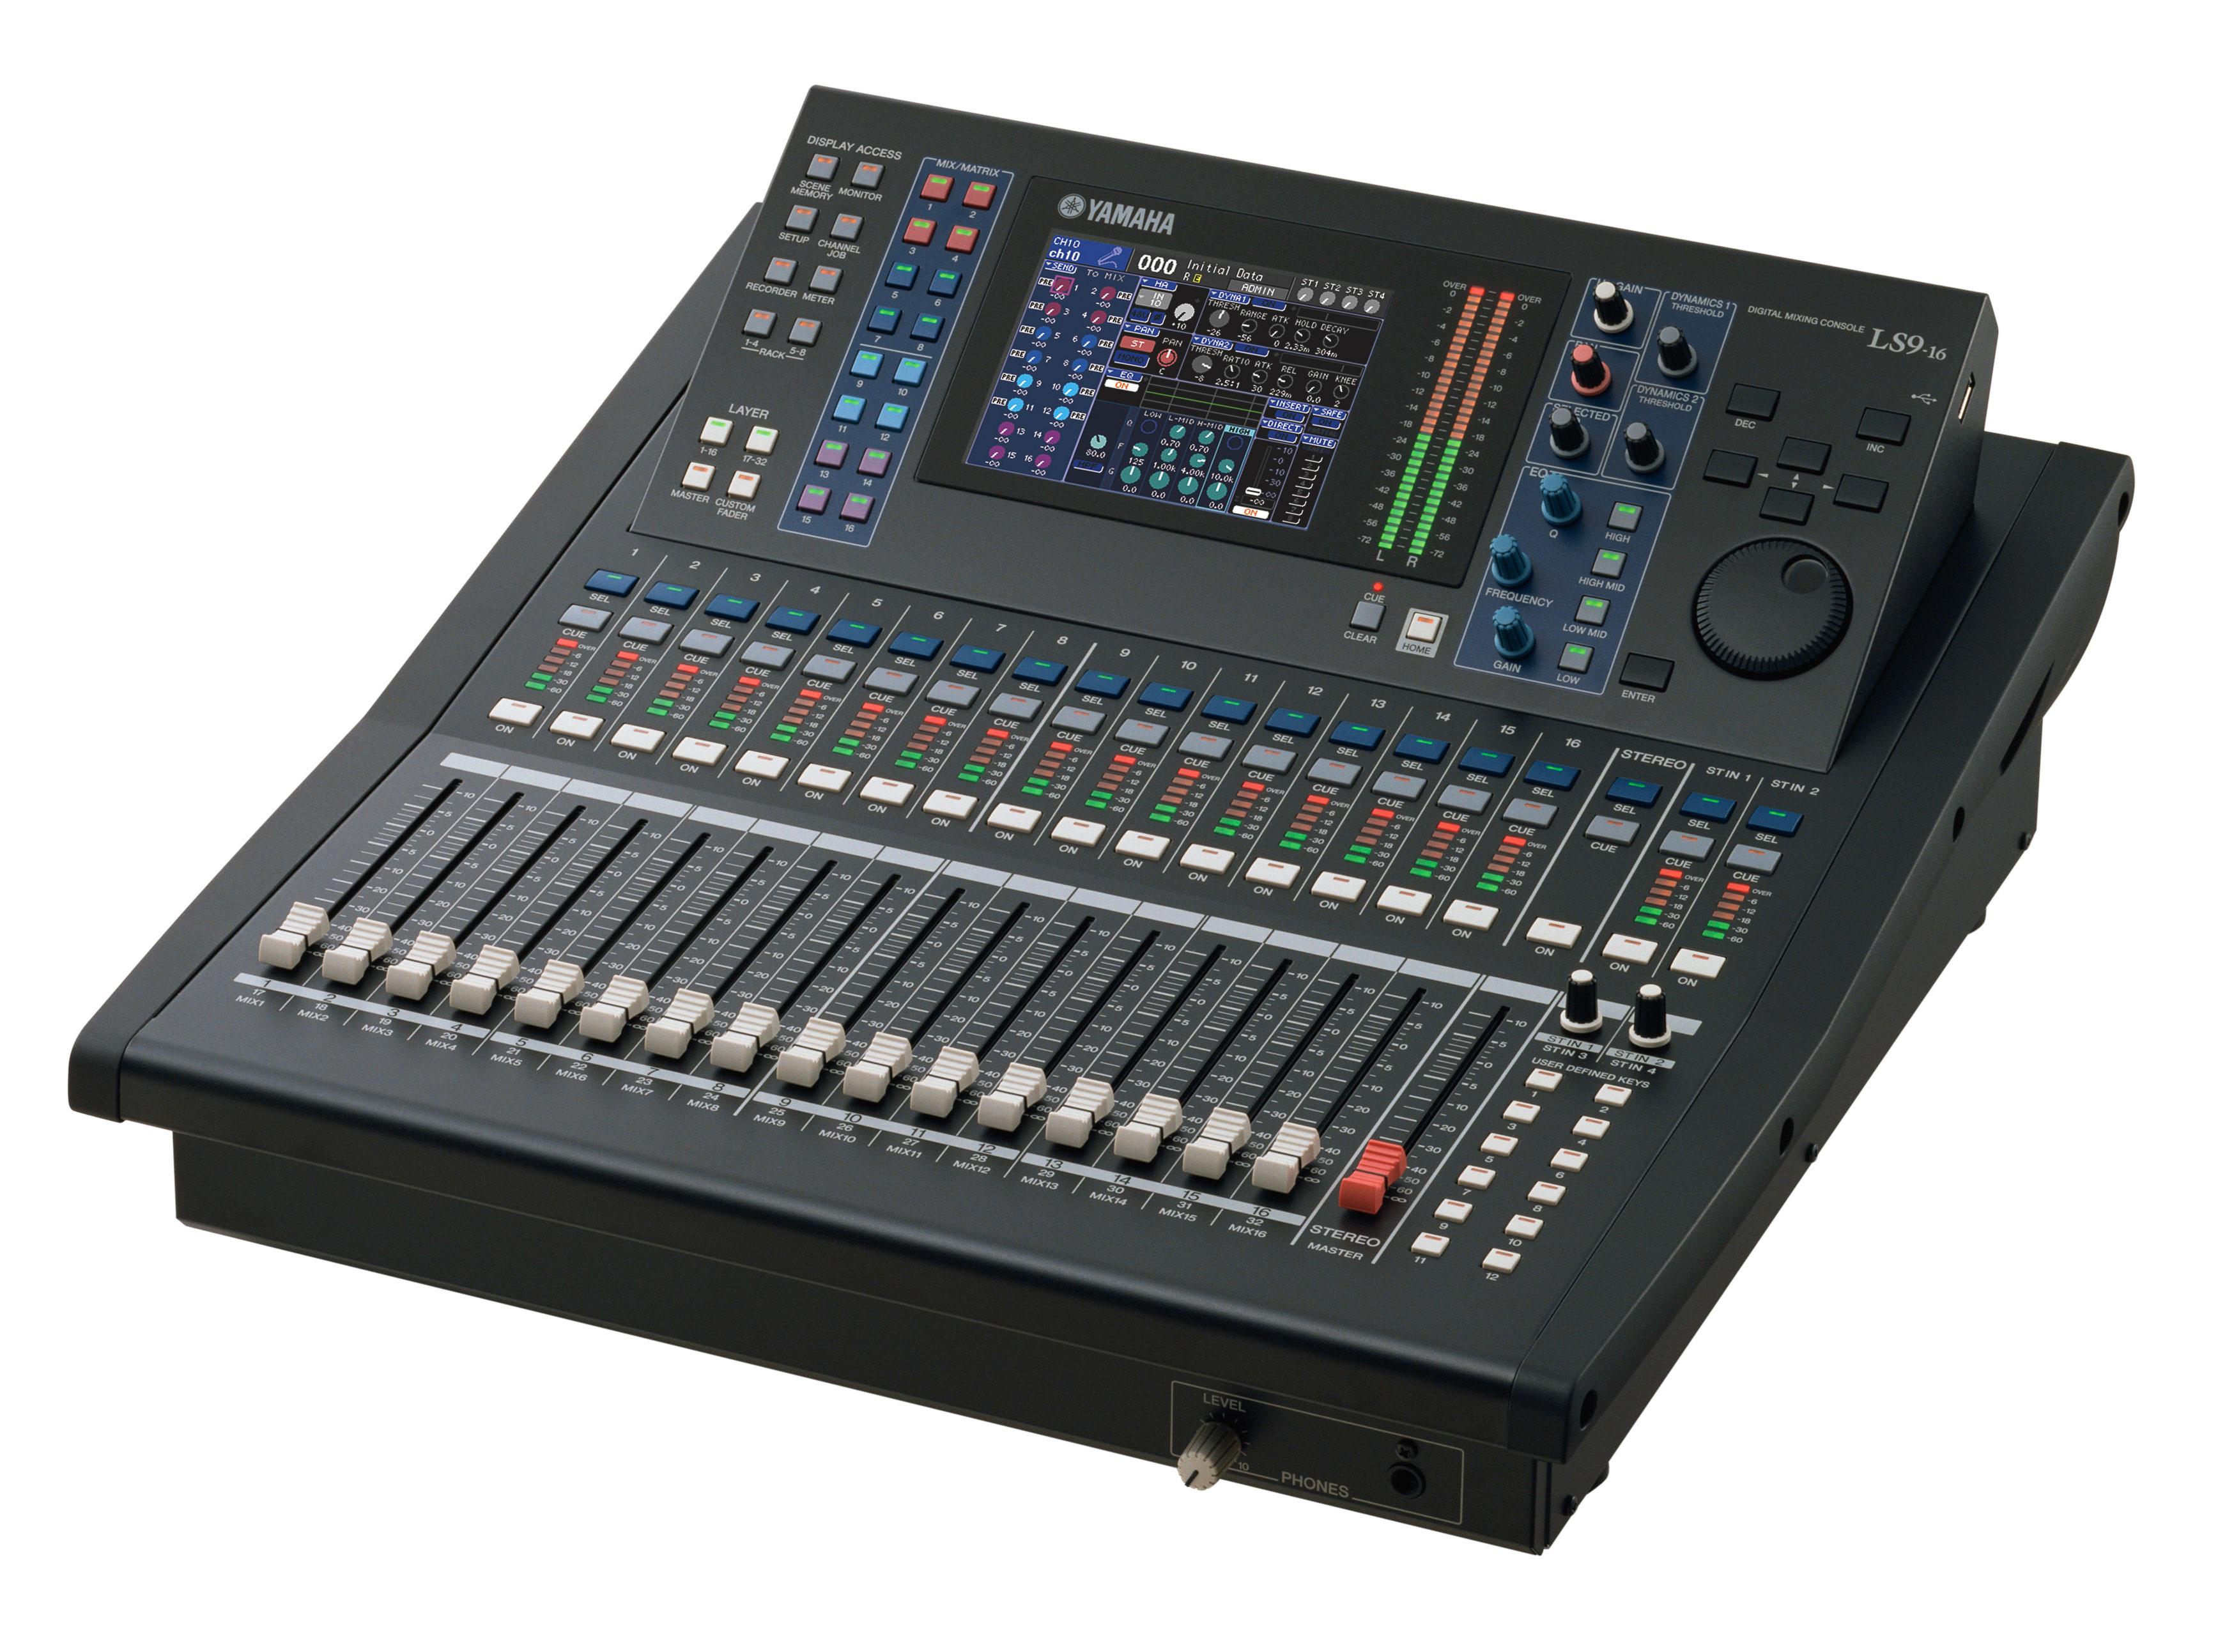 Yamaha Ls  Digital Audio Console Price